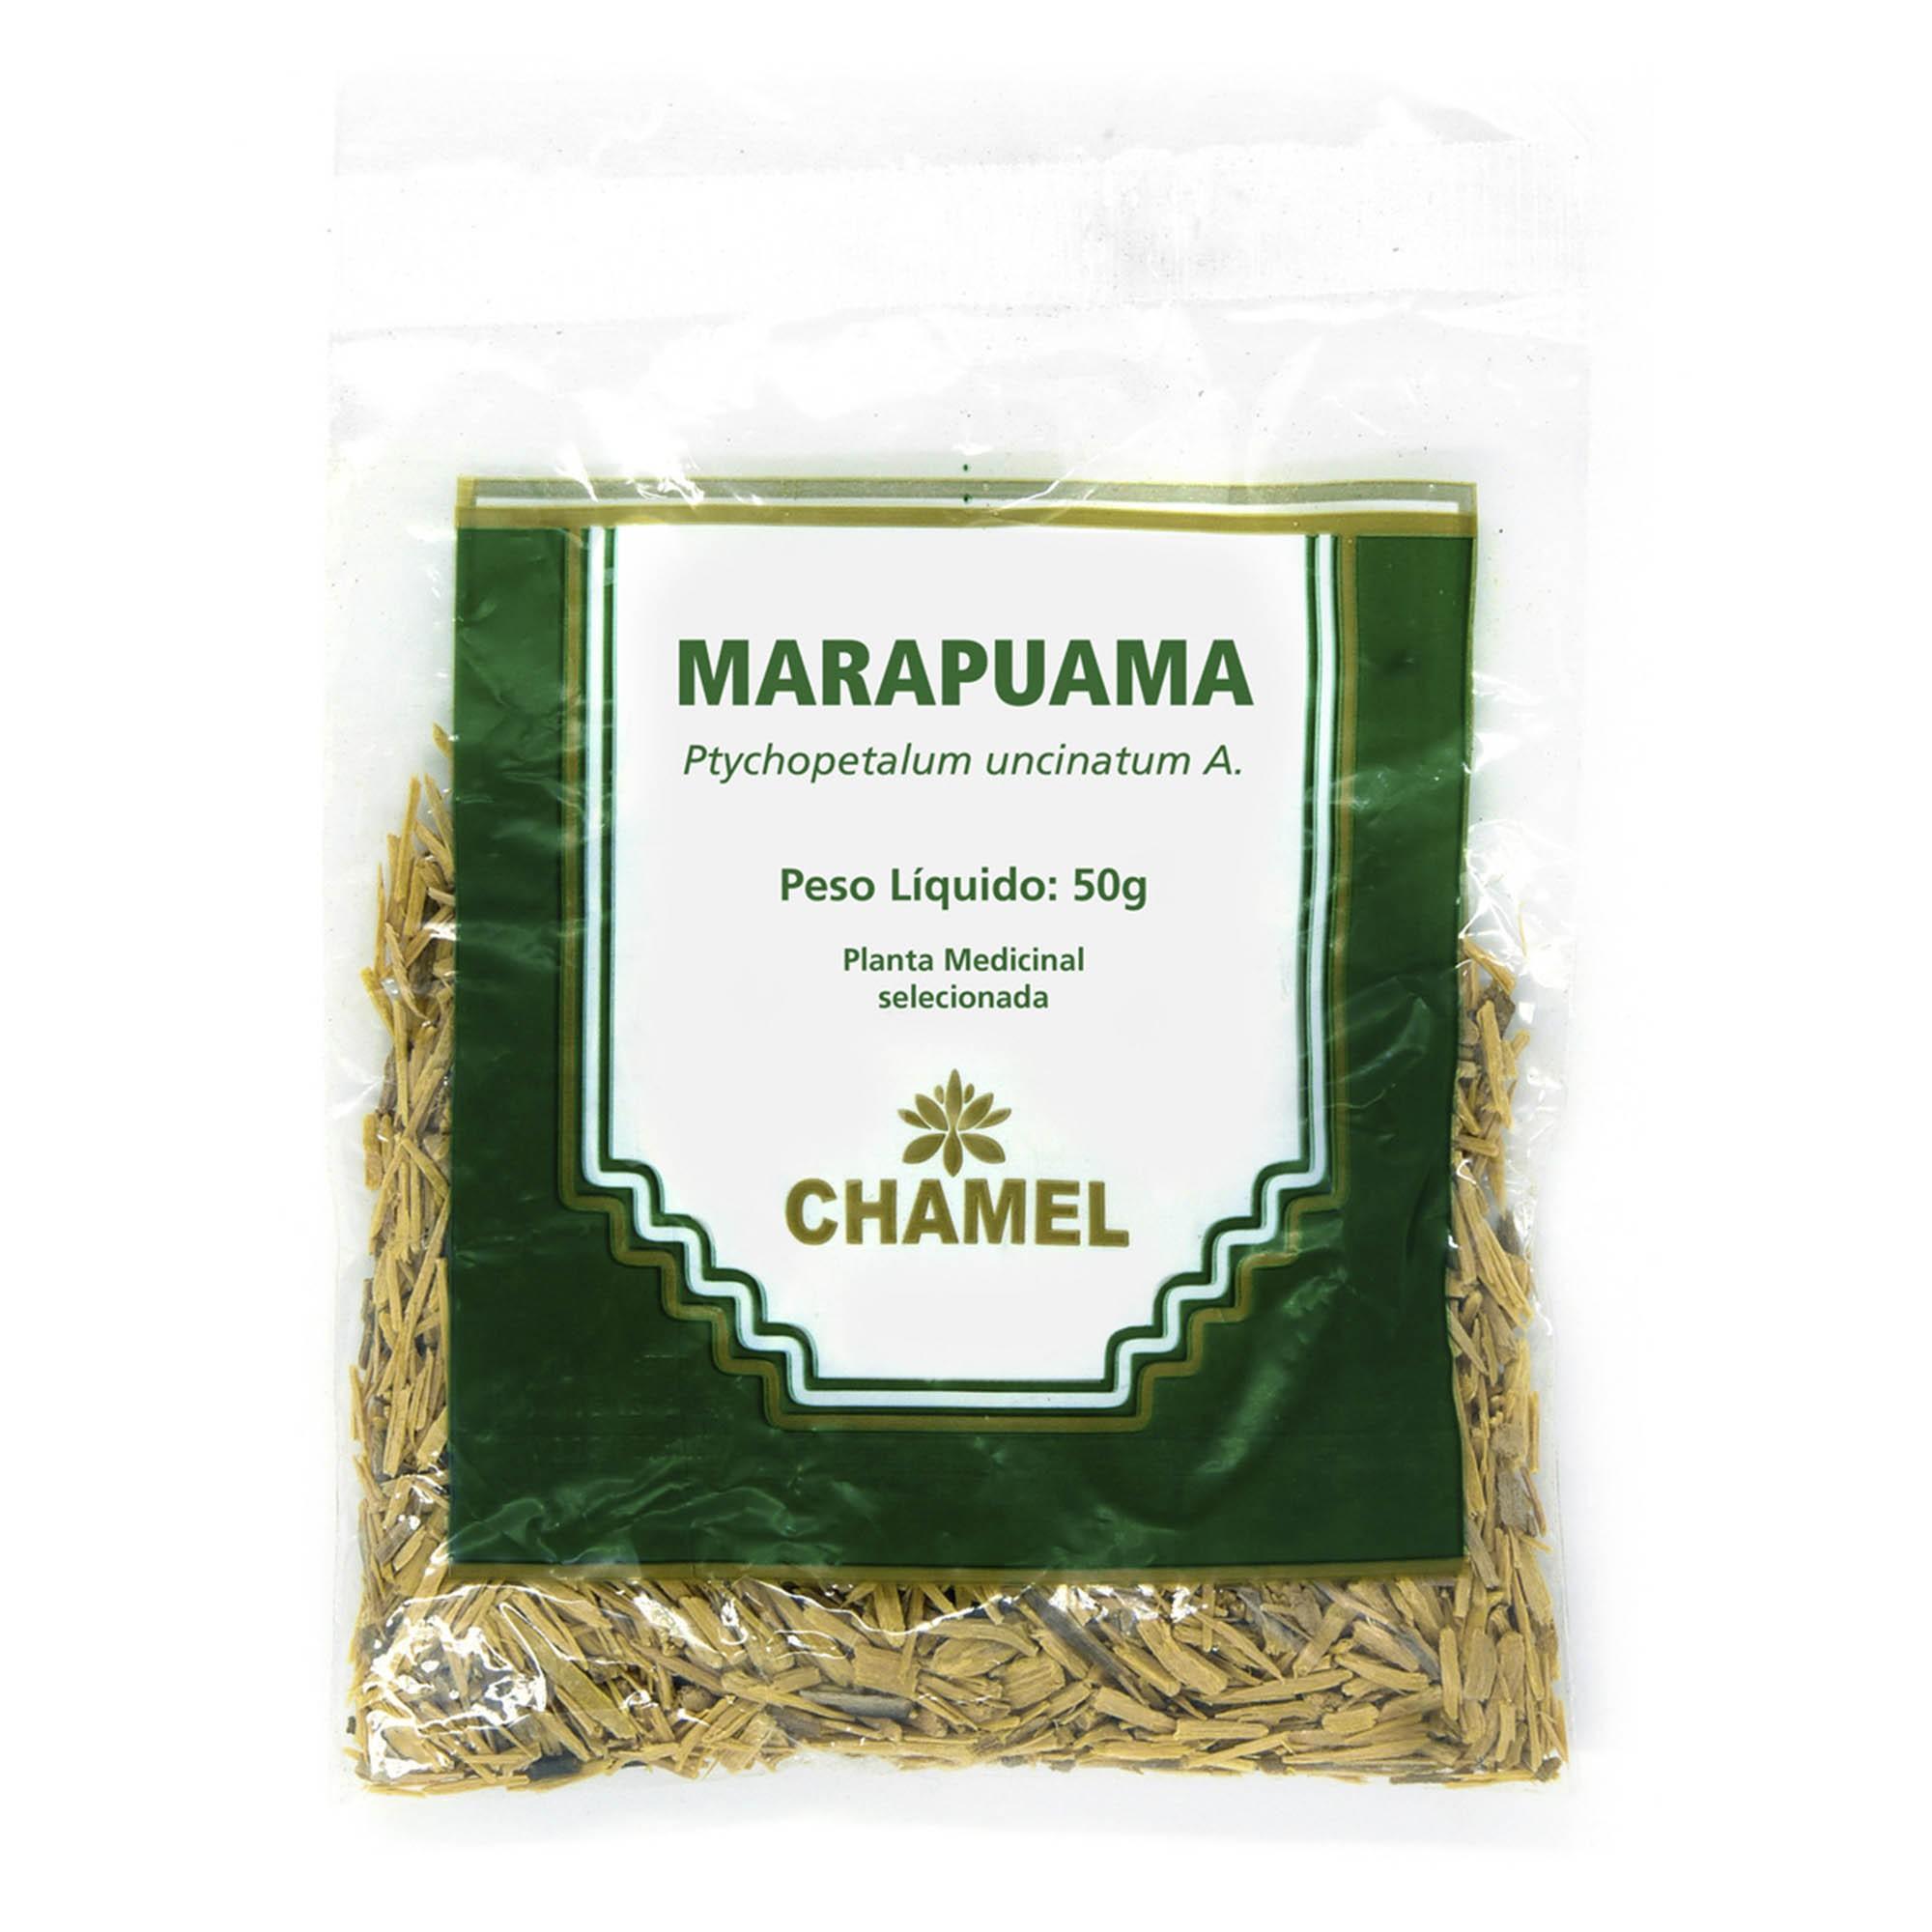 Marapuama 50g Chamel - Chá-Raízes